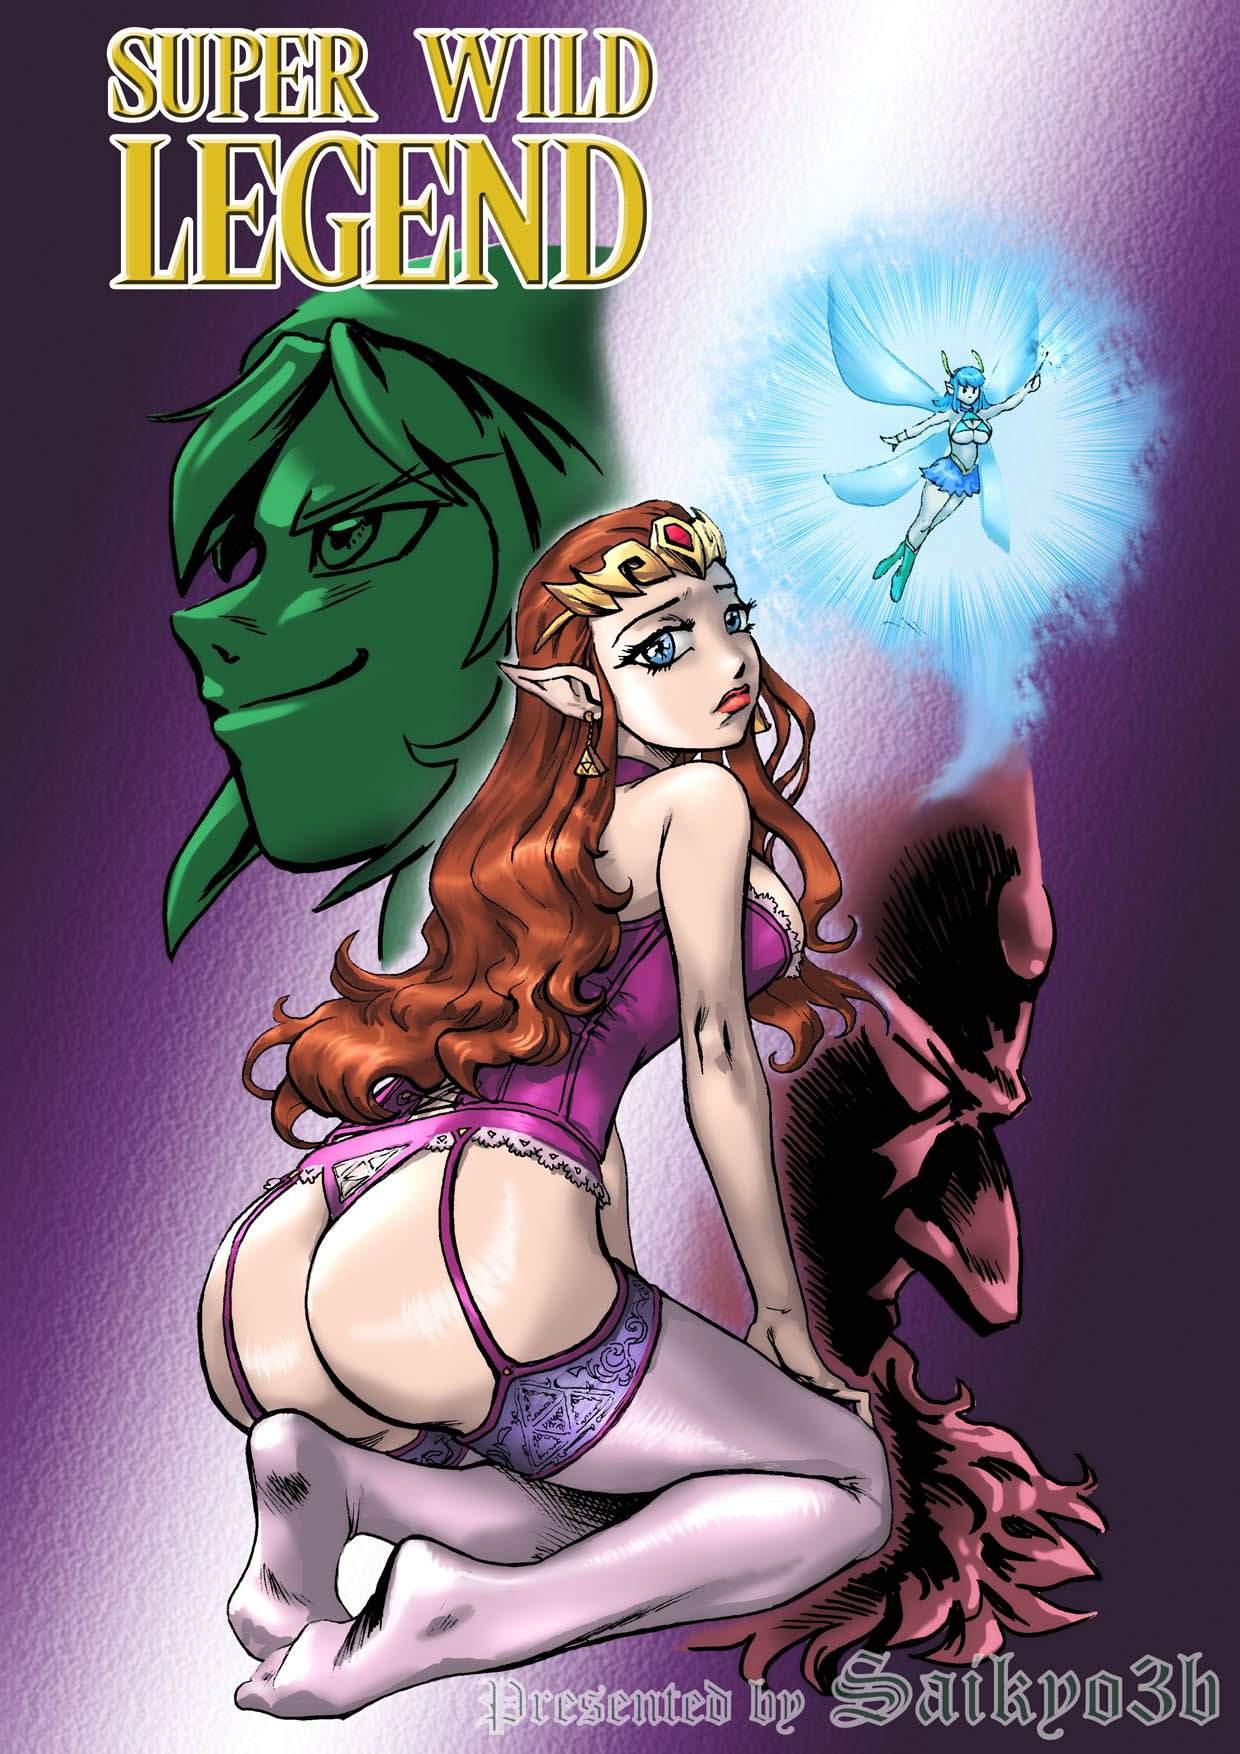 SureFap xxx porno The Legend of Zelda - [Saikyo3b] - Super Wild Legend